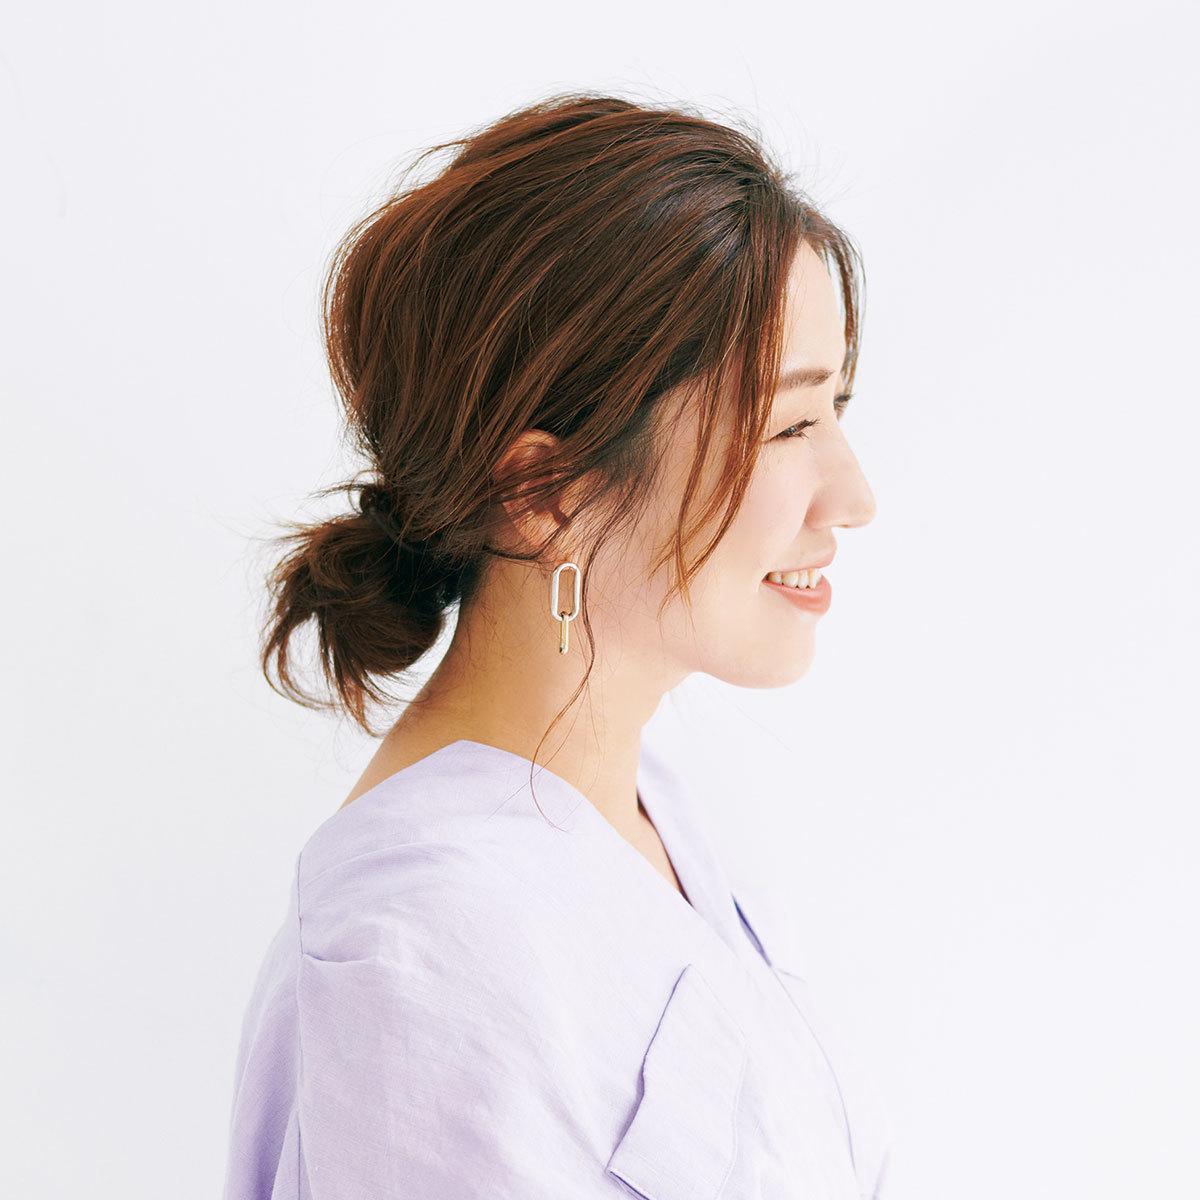 https://marisol.hpplus.jp/article/58117